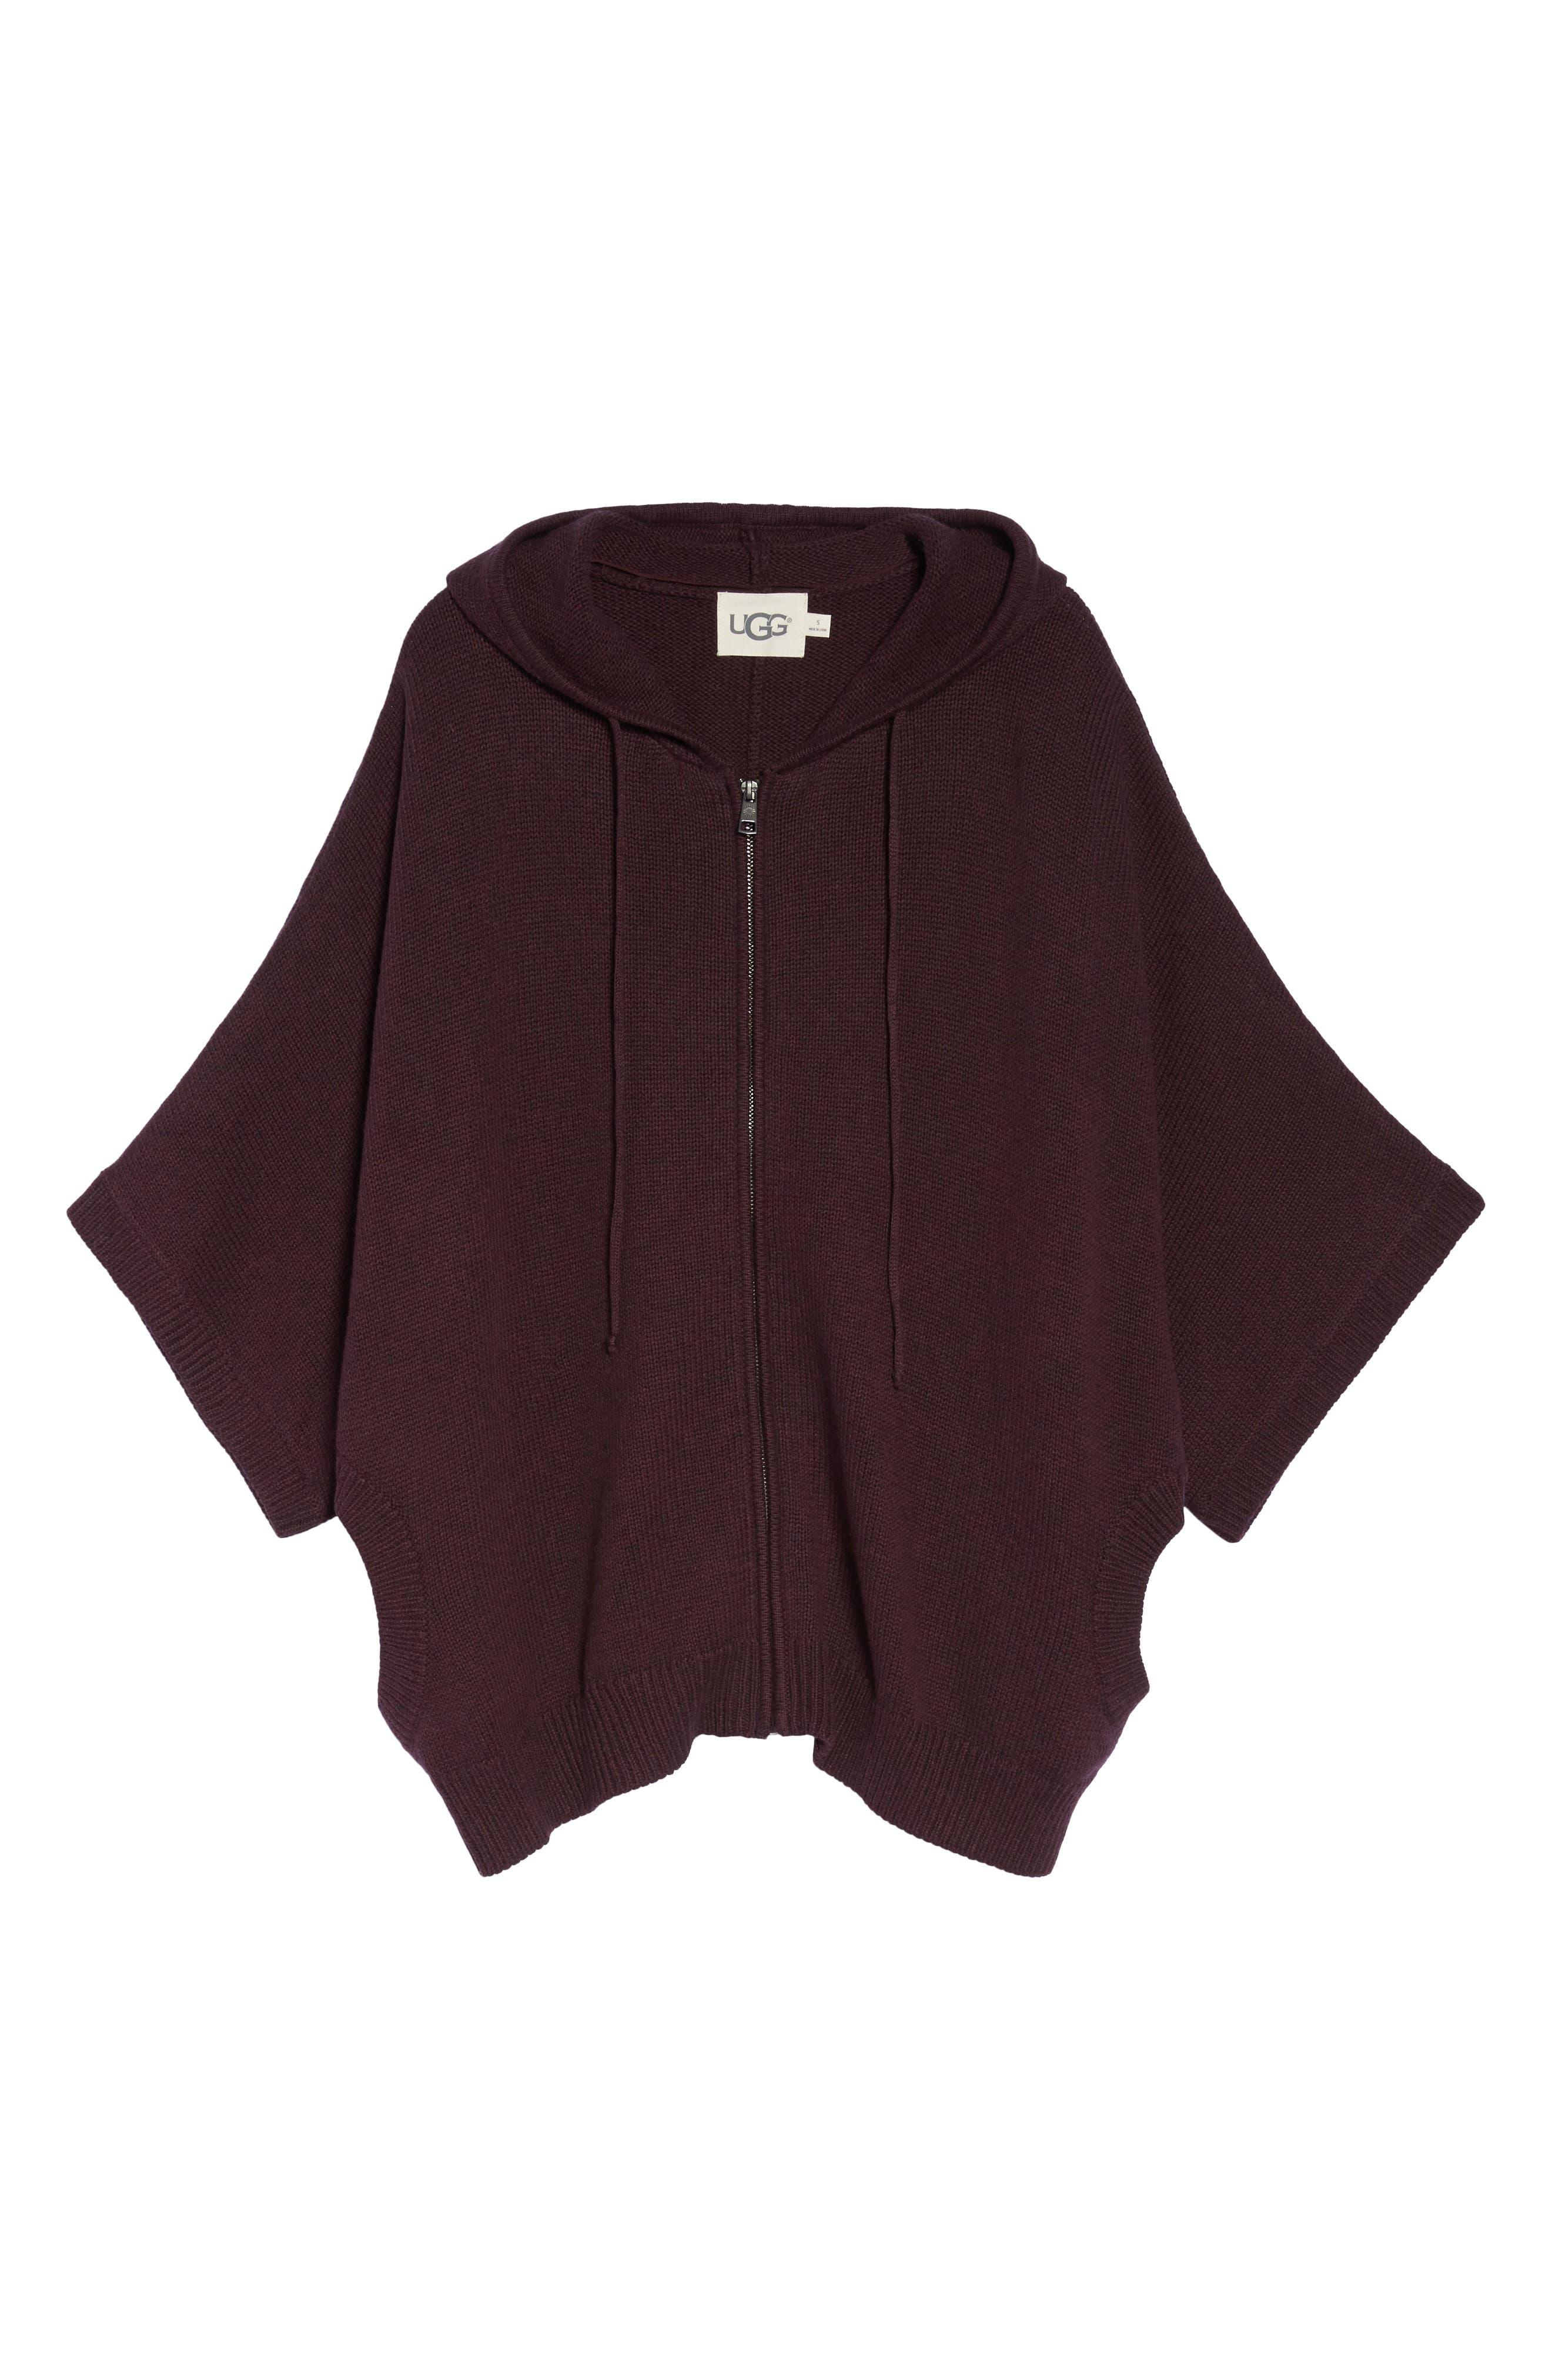 Alternate Image 4  - UGG® Sweater Knit Poncho